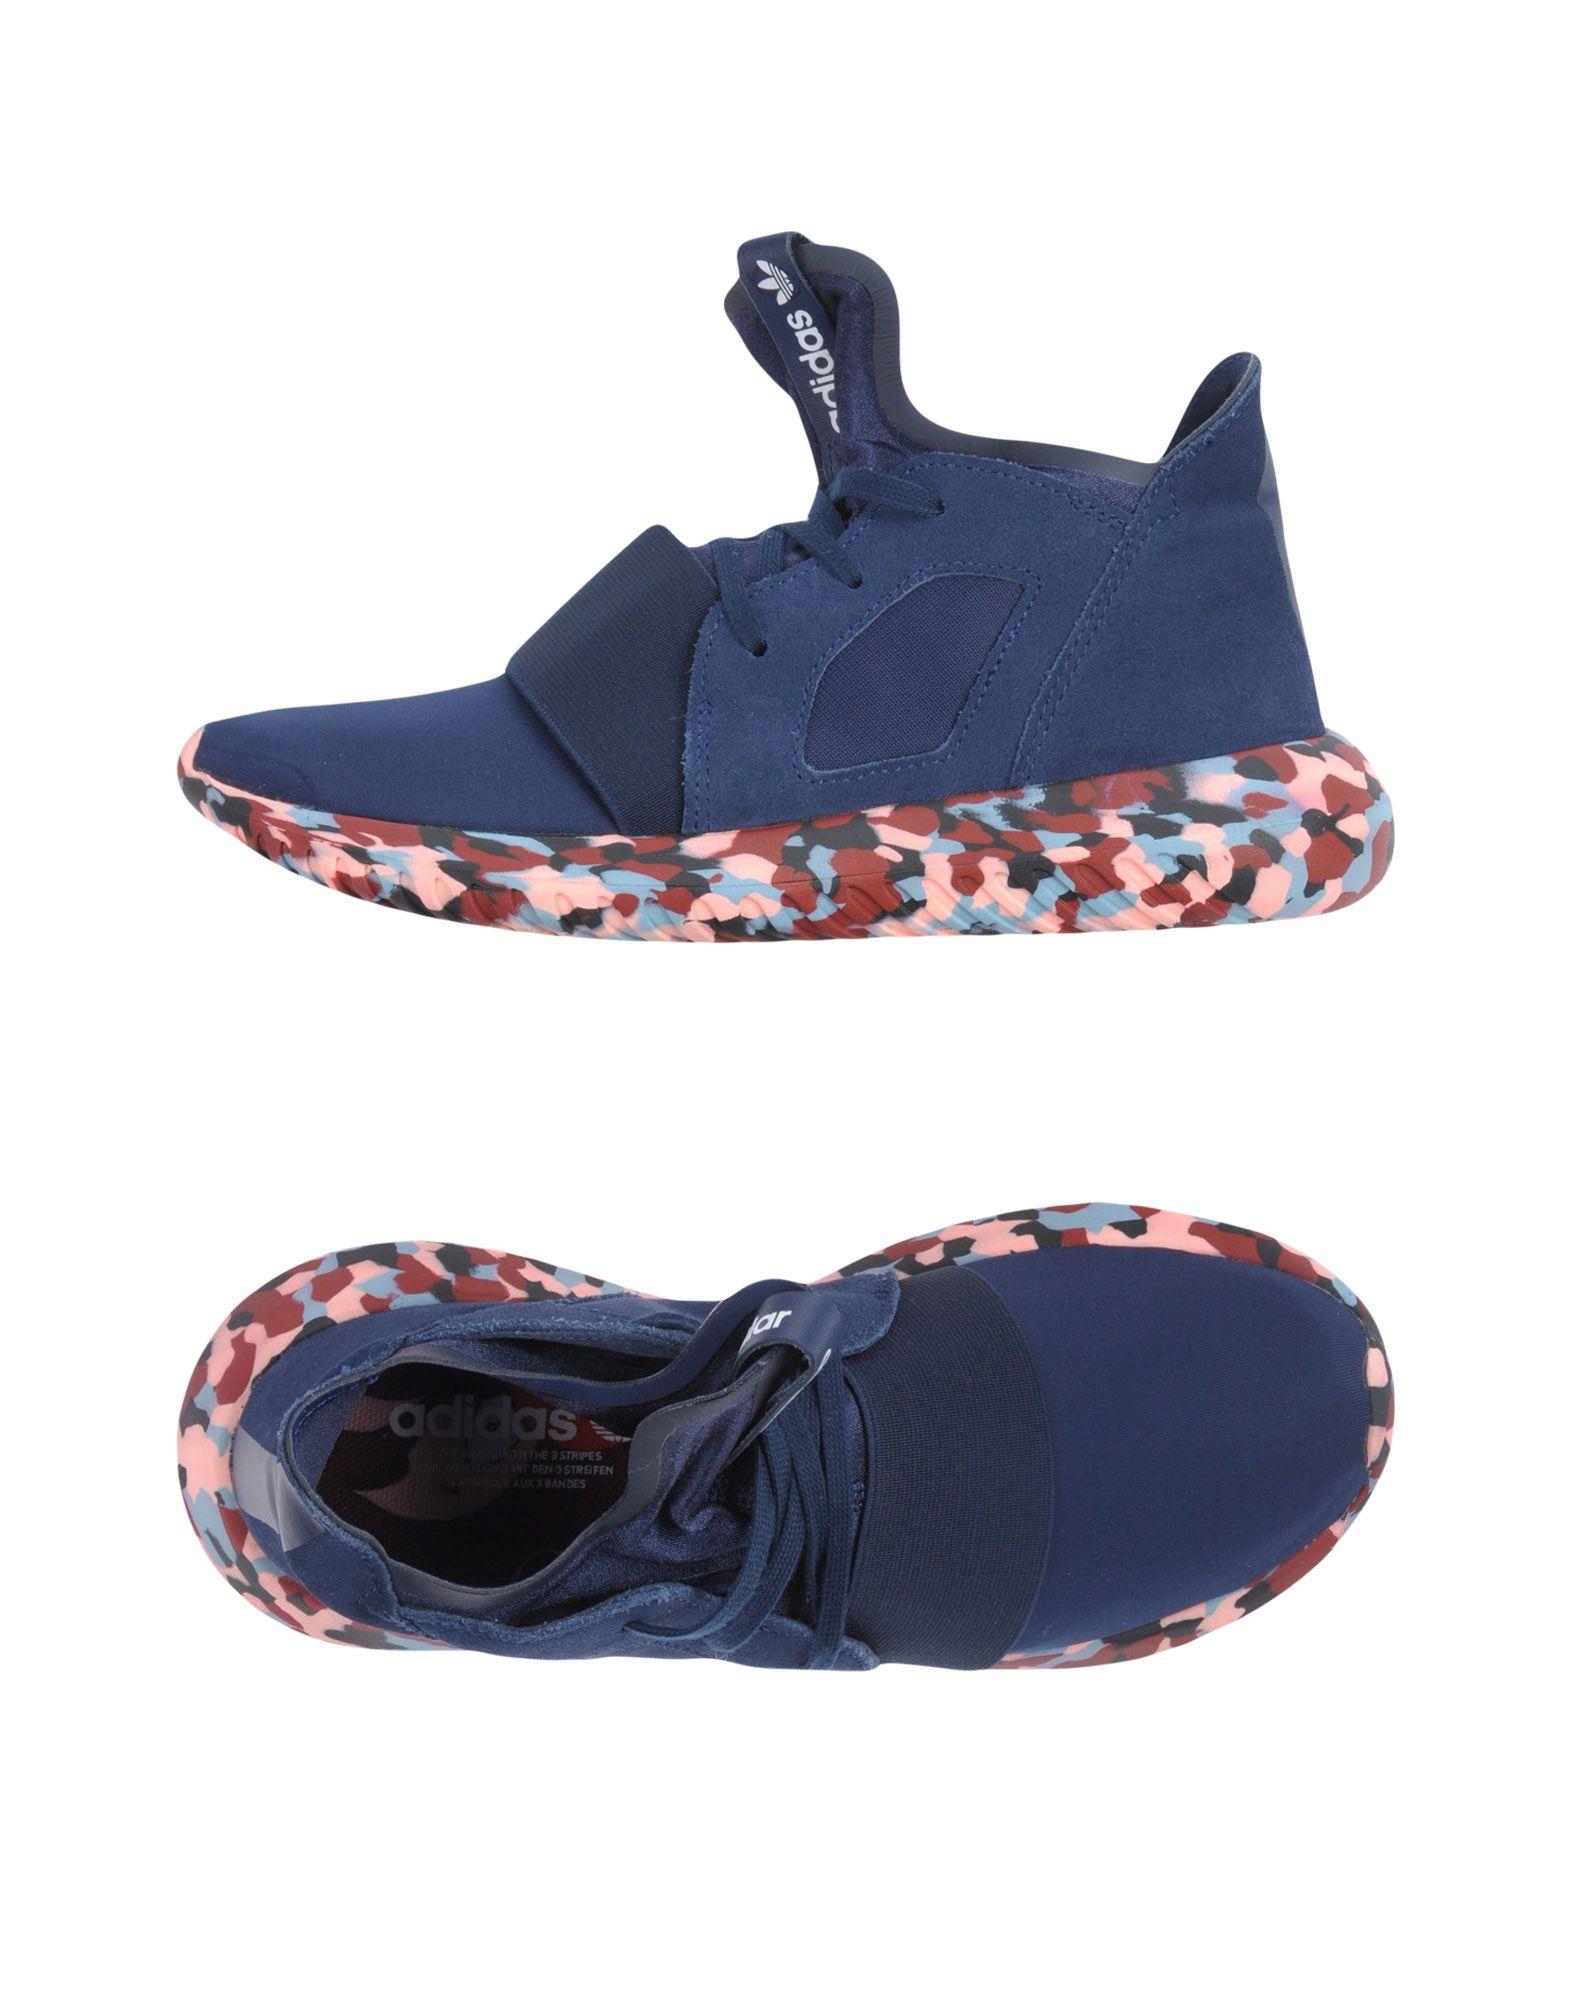 Adidas Originals Sneakers Damen  11392203NC Gute Qualität beliebte beliebte Qualität Schuhe ac9587